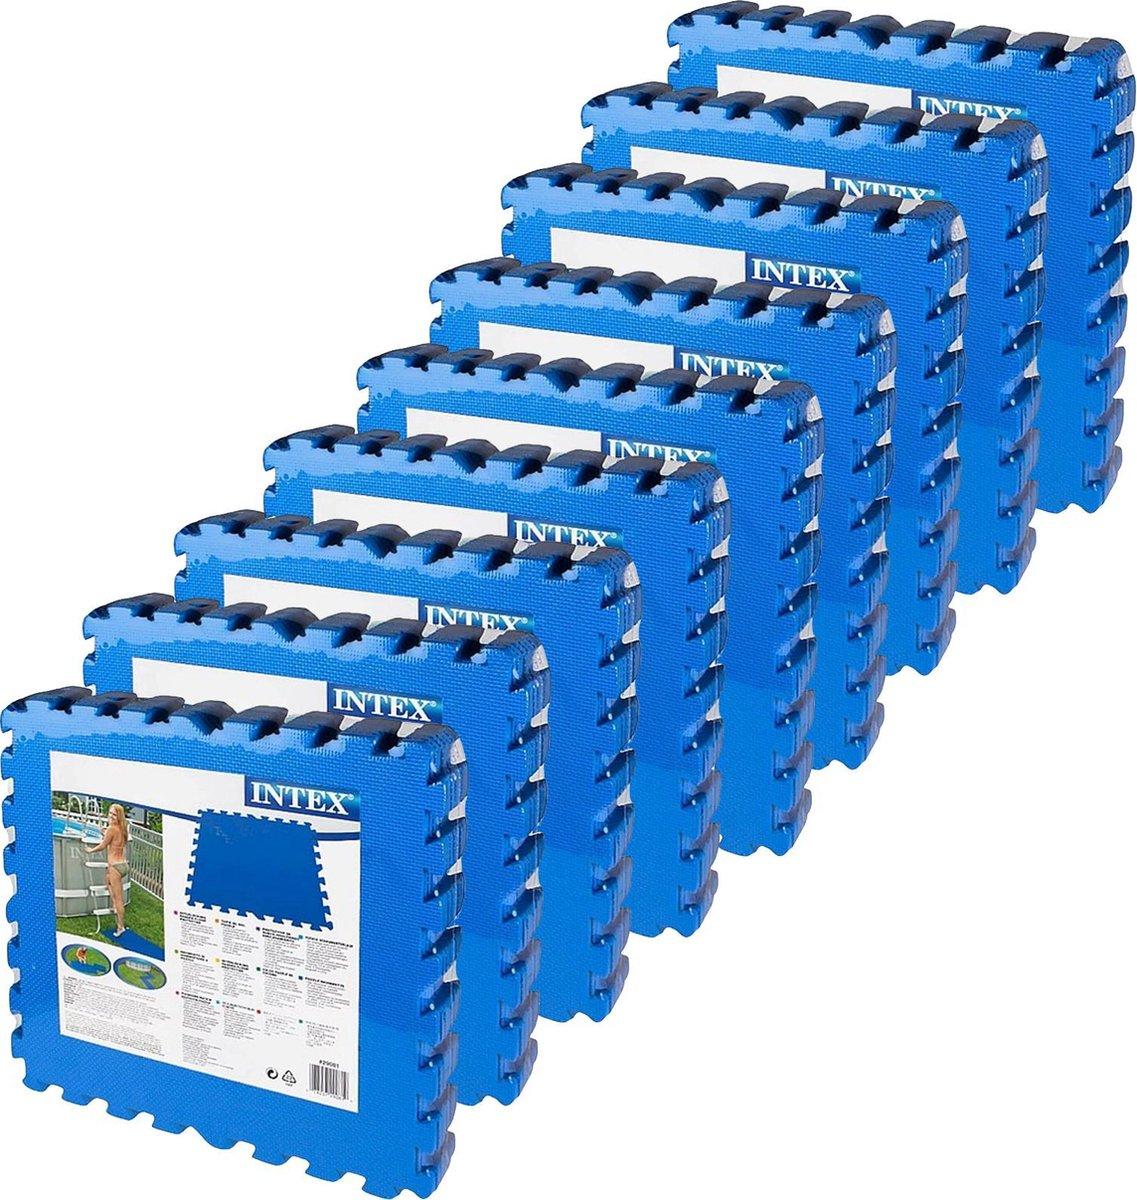 Intex - zwembad tegels - blauw - 50 x 50 cm - 72 tegels - 18 m2 - zwembad ondertegels